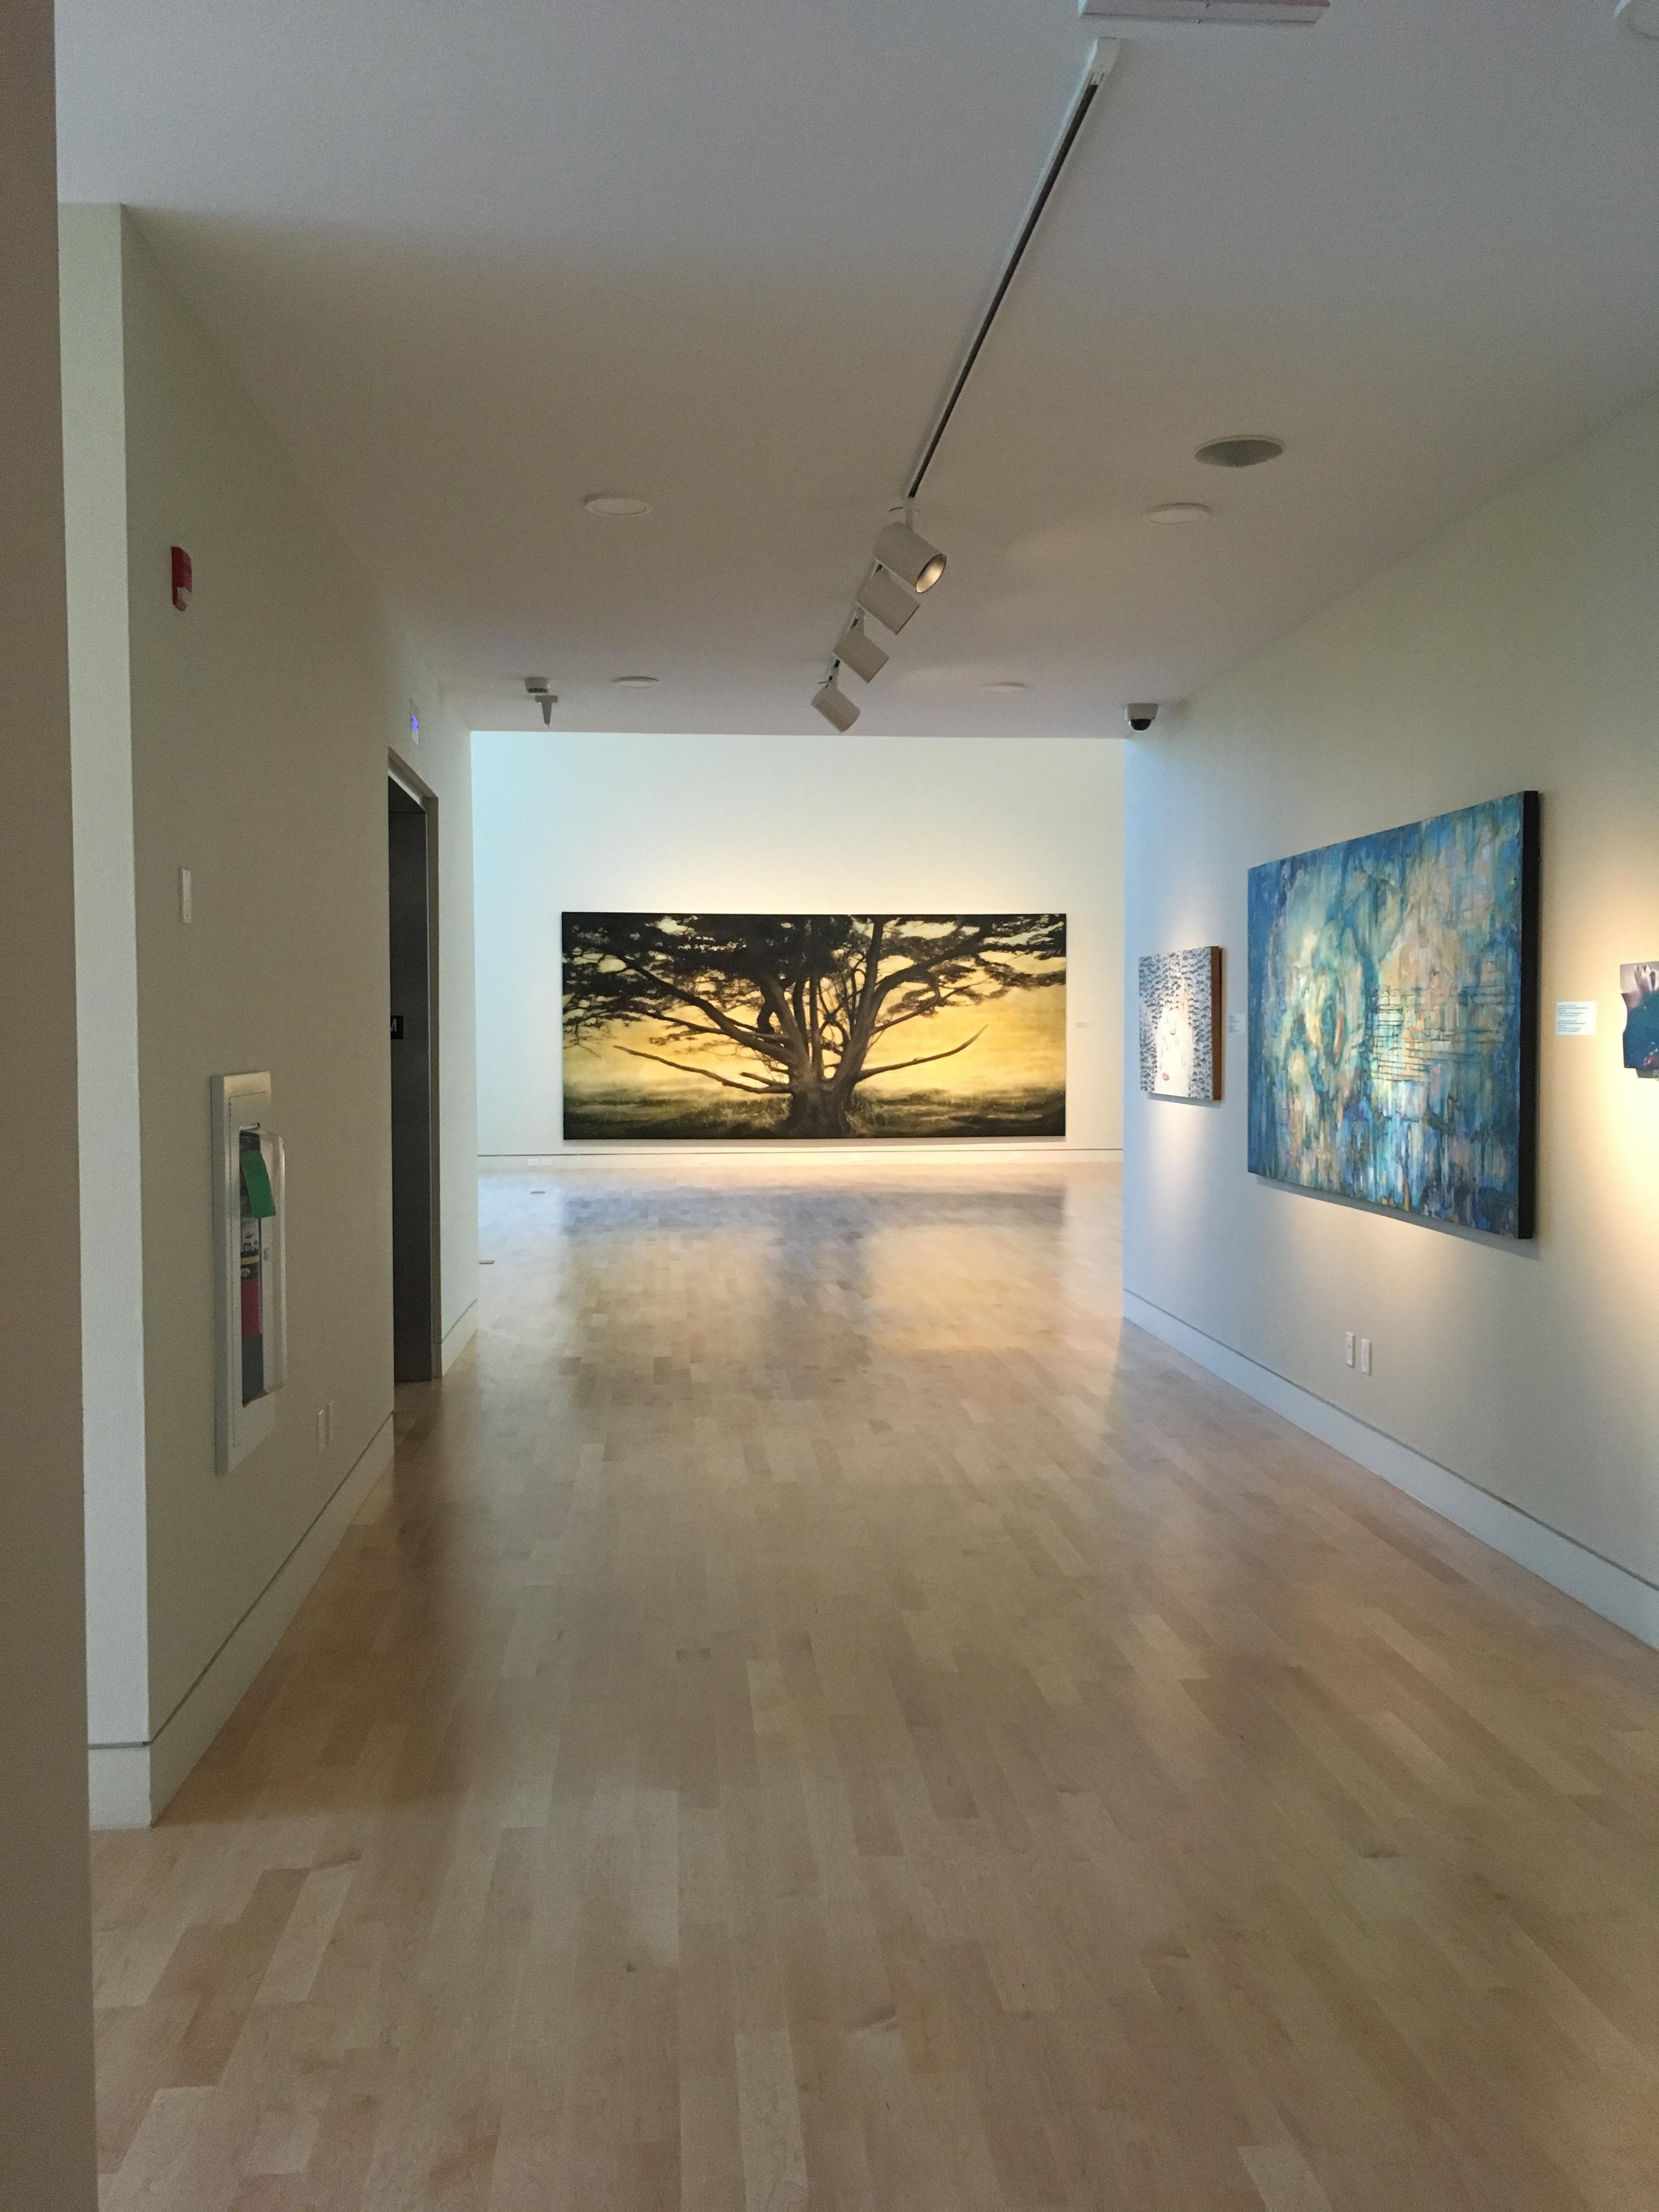 beaverbrook-art-gallery-frederiction-nouveau-brunswick